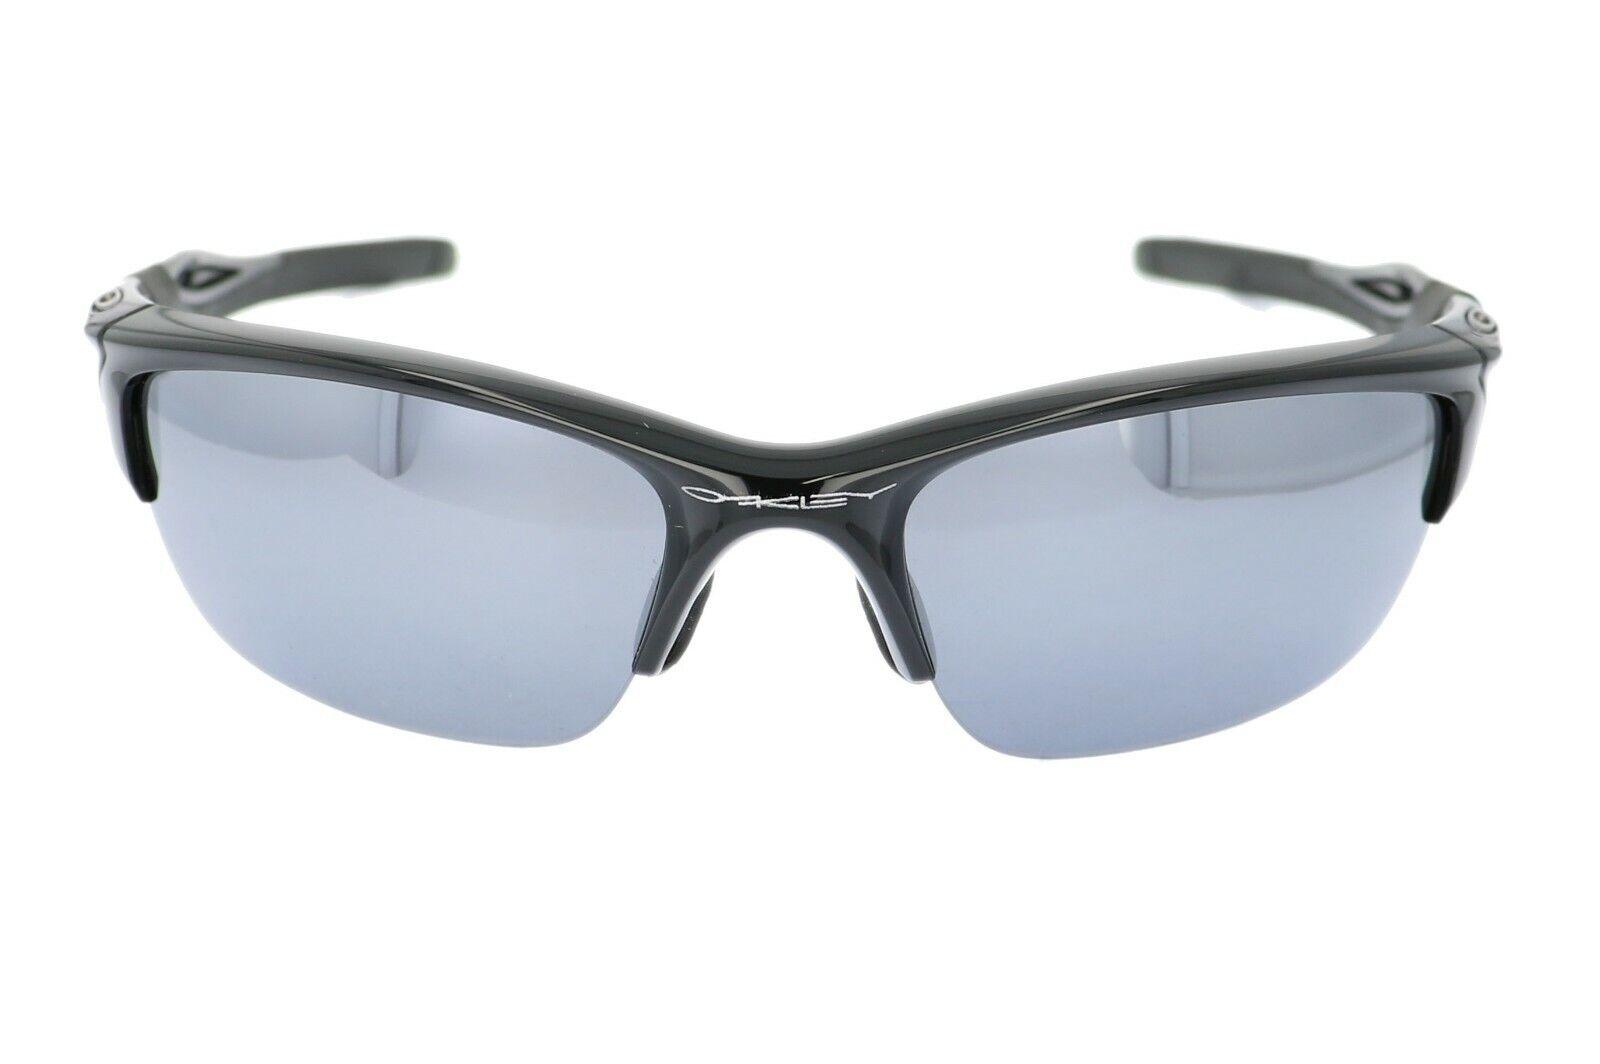 oakley-half-jacket-2-0-mens-black-iridium-hdo-optics-sunglasses-oo9144-01